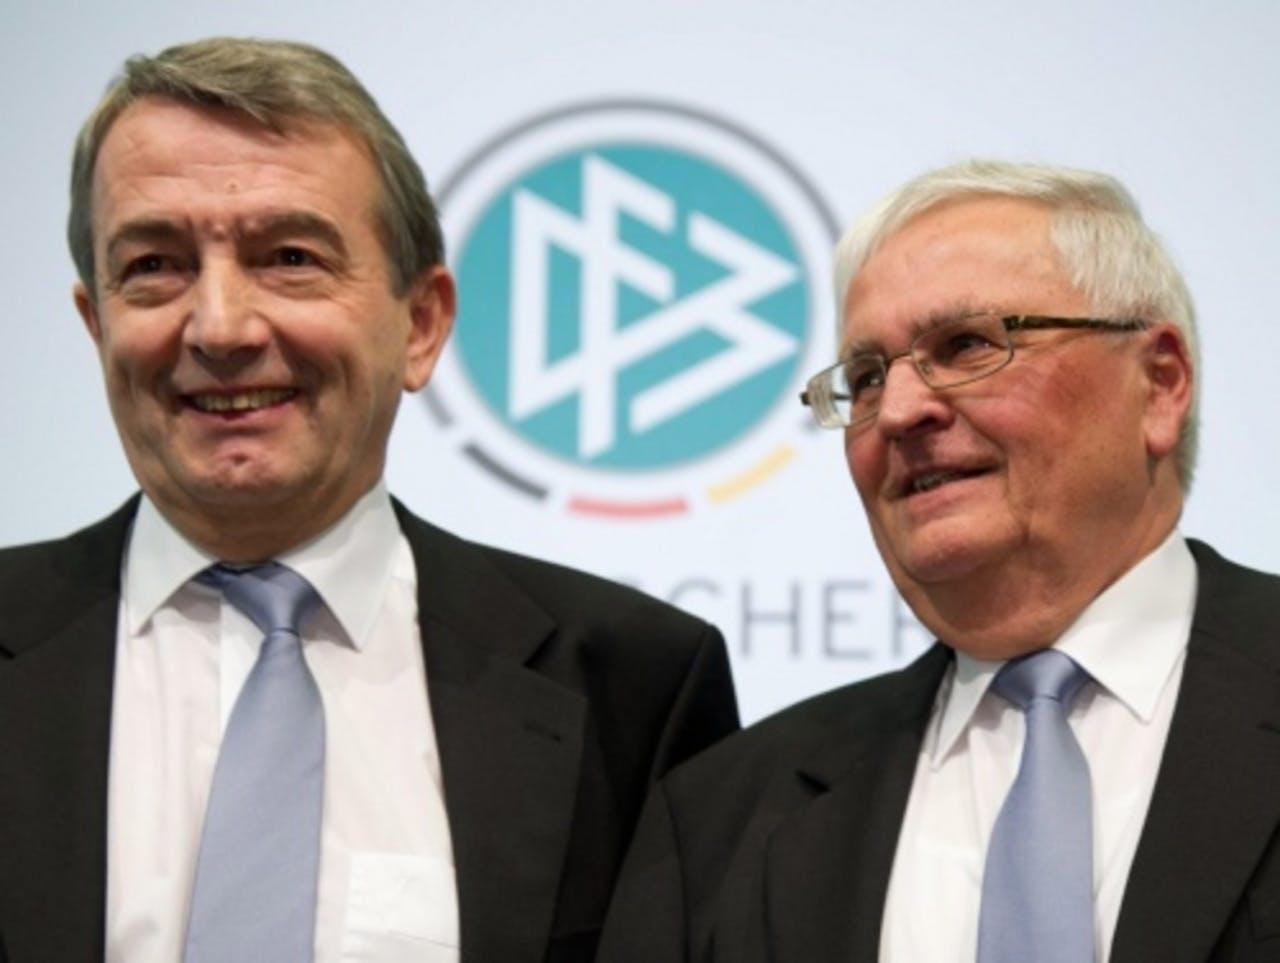 Wolfgang Niersbach (L) en Theo Zwanziger (R). EPA